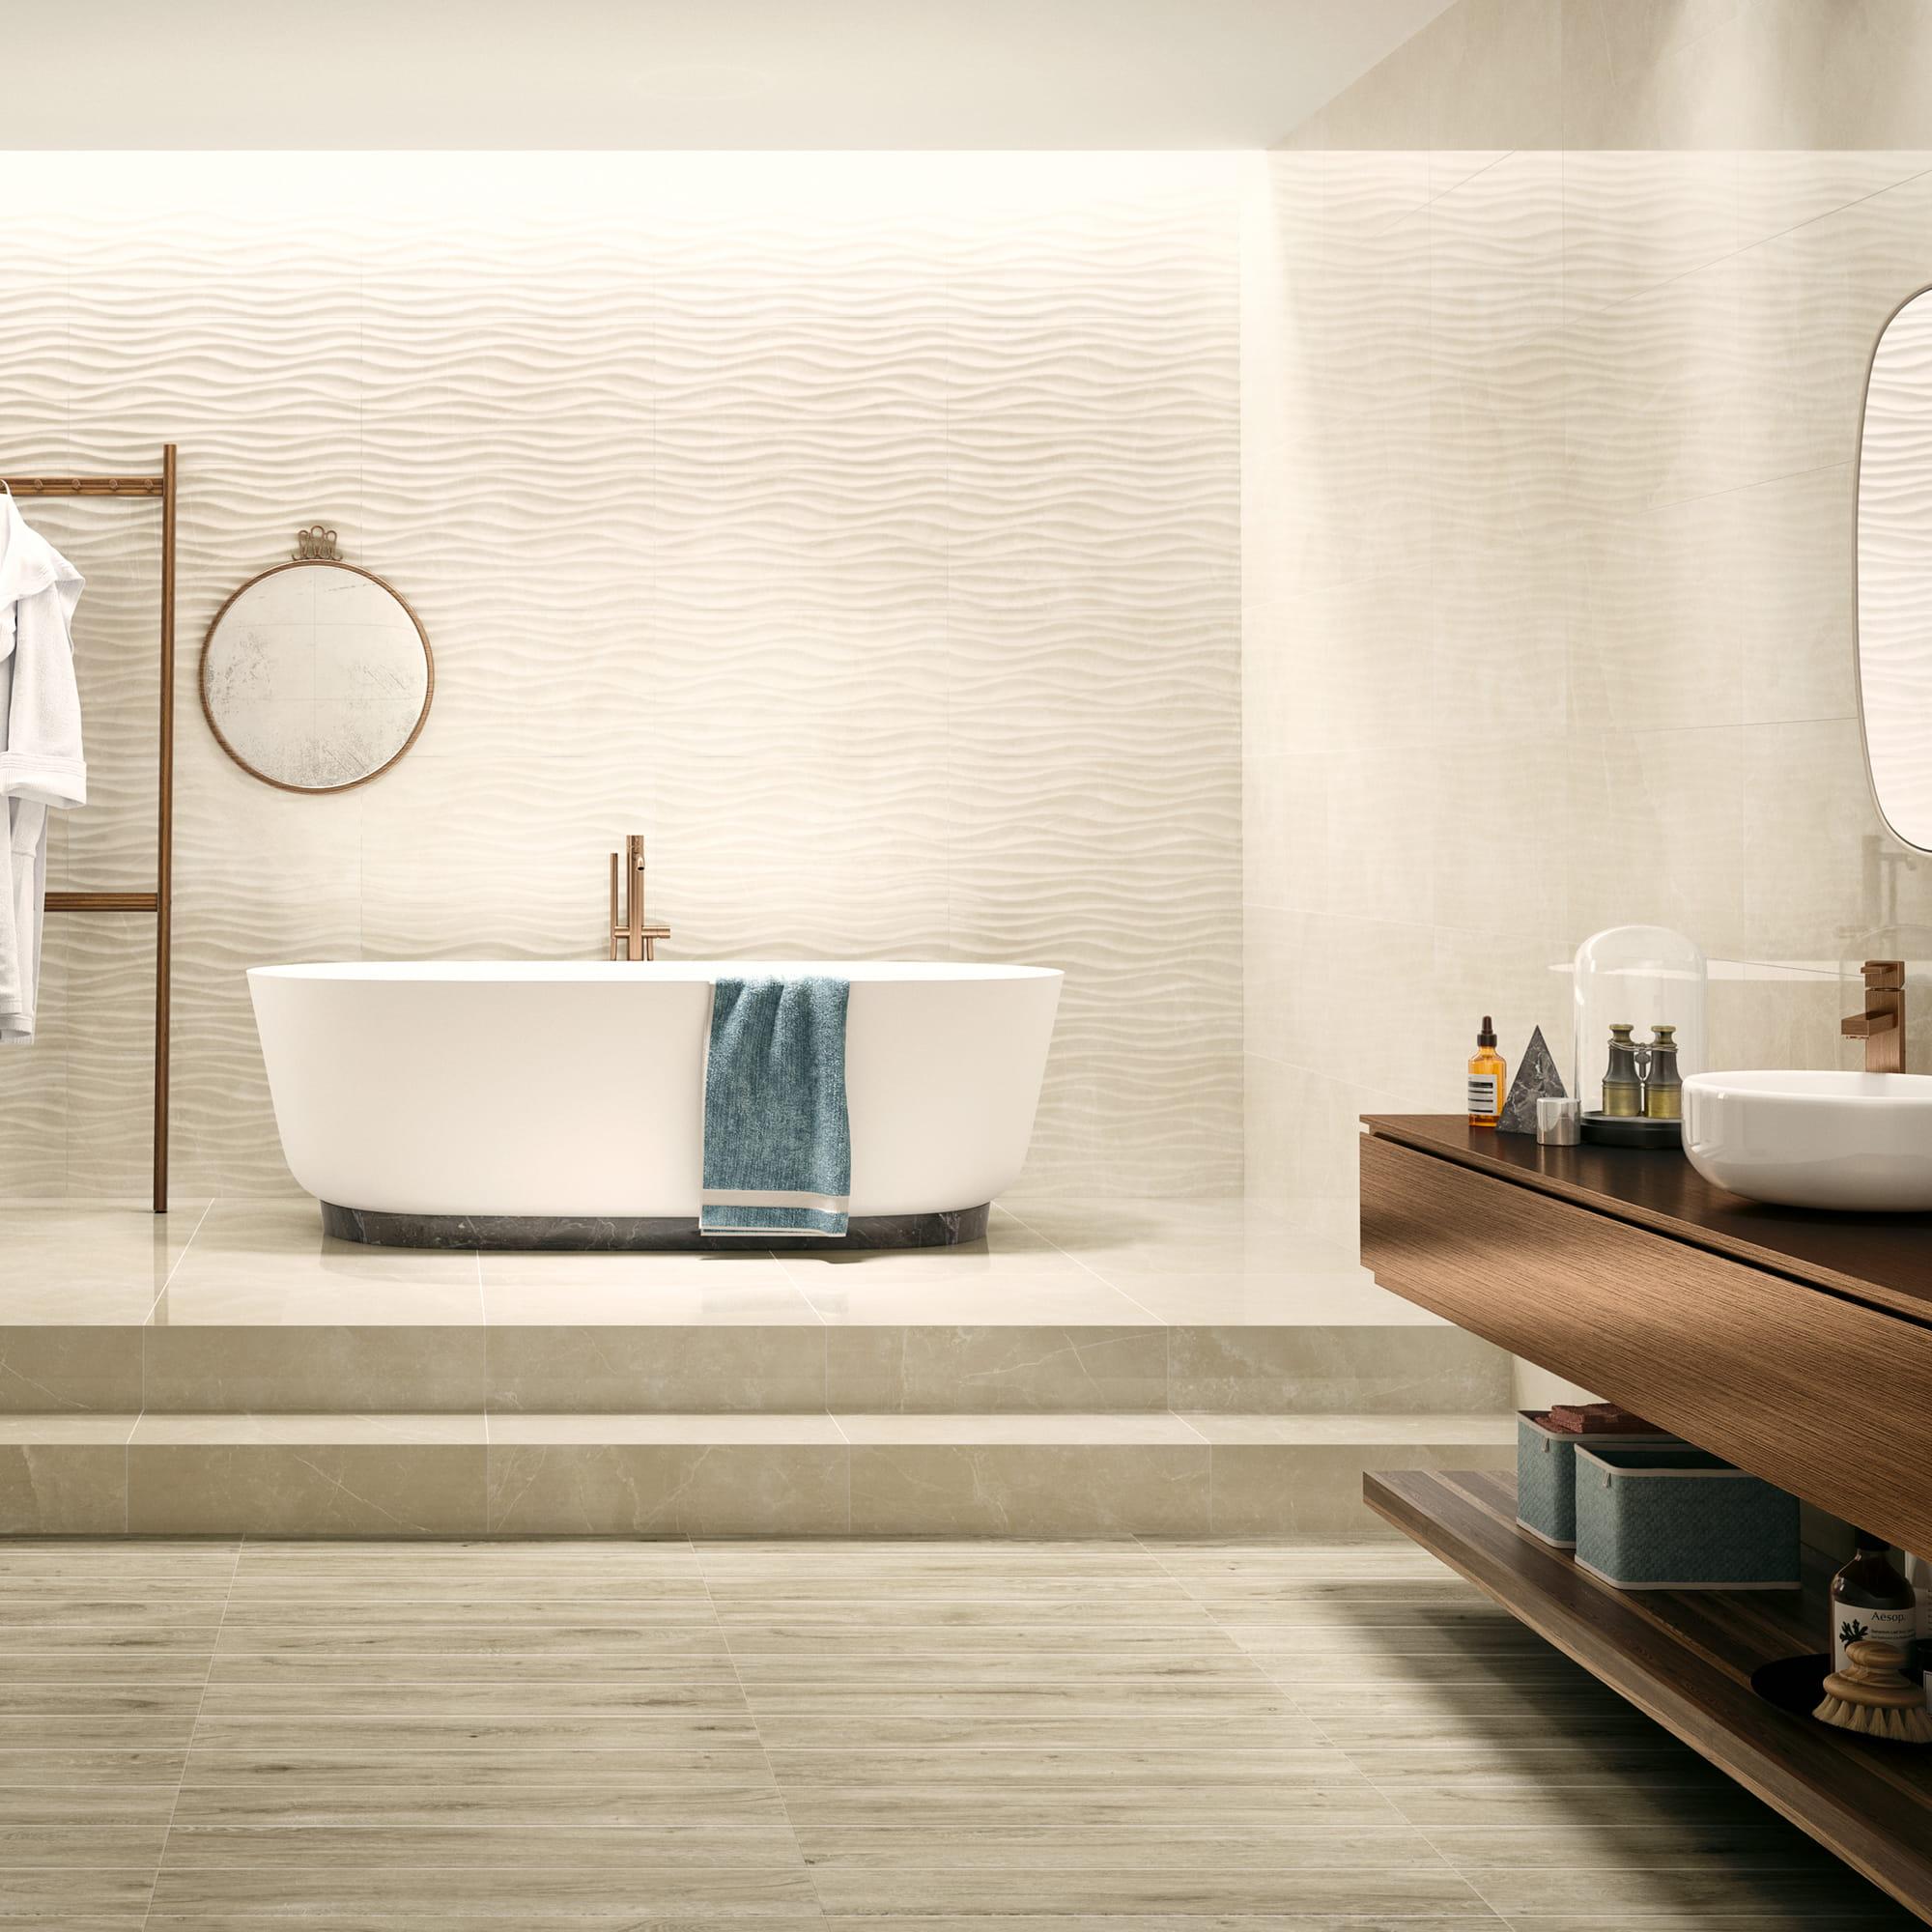 Marble Cream Shine - 35 x 70 RET. | Mosaic Curl Cream Shine - 35 x 70 RET. | Marble Cream Pol. - 60 x 60 RET. | Tree Tortora - 15 x 75